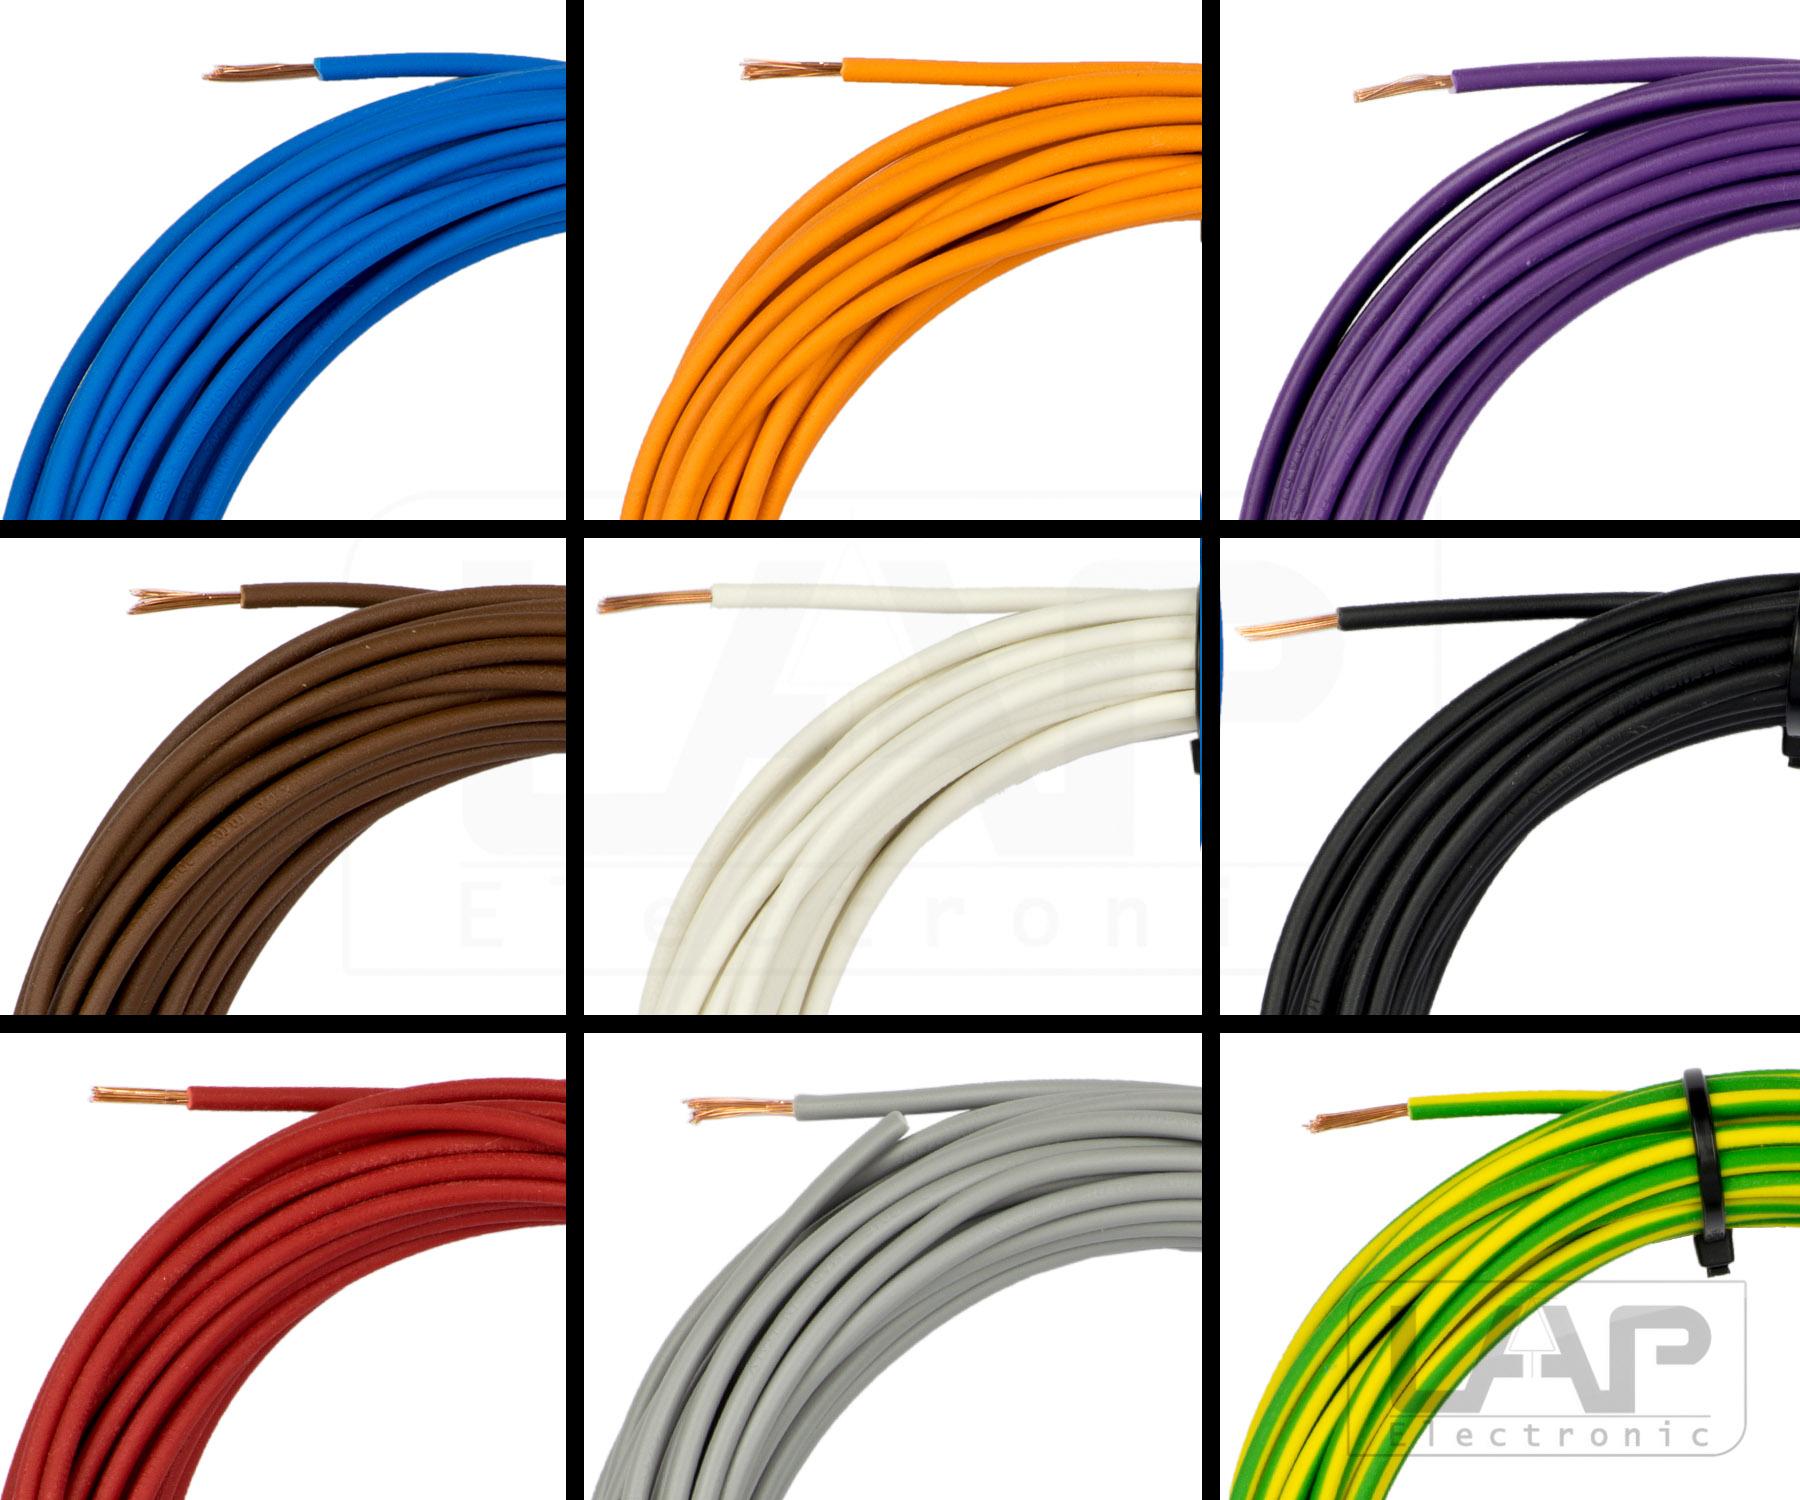 ⭐️Lapp Kabel⭐️ H07V-K H05V-K 0,75 1,0 1,5 2,5 4 6 10 16mm² Einzelader Litze